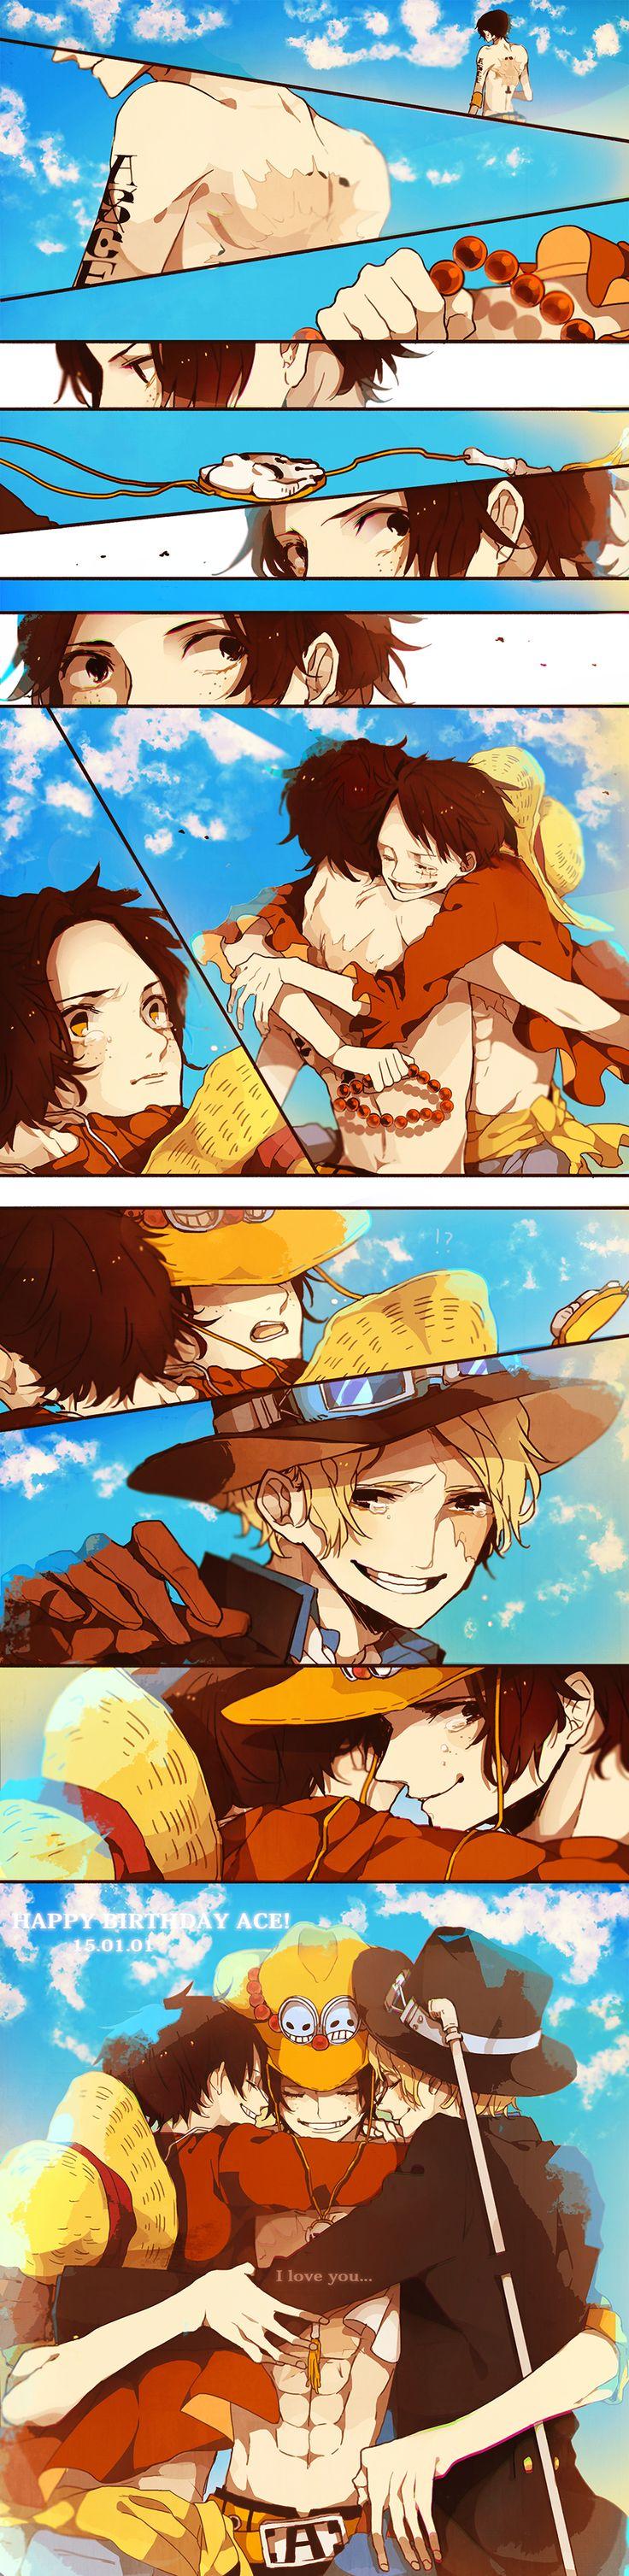 Fanart, ONE PIECE, Monkey D. Luffy, Comic, Portgas D. Ace, Sabo